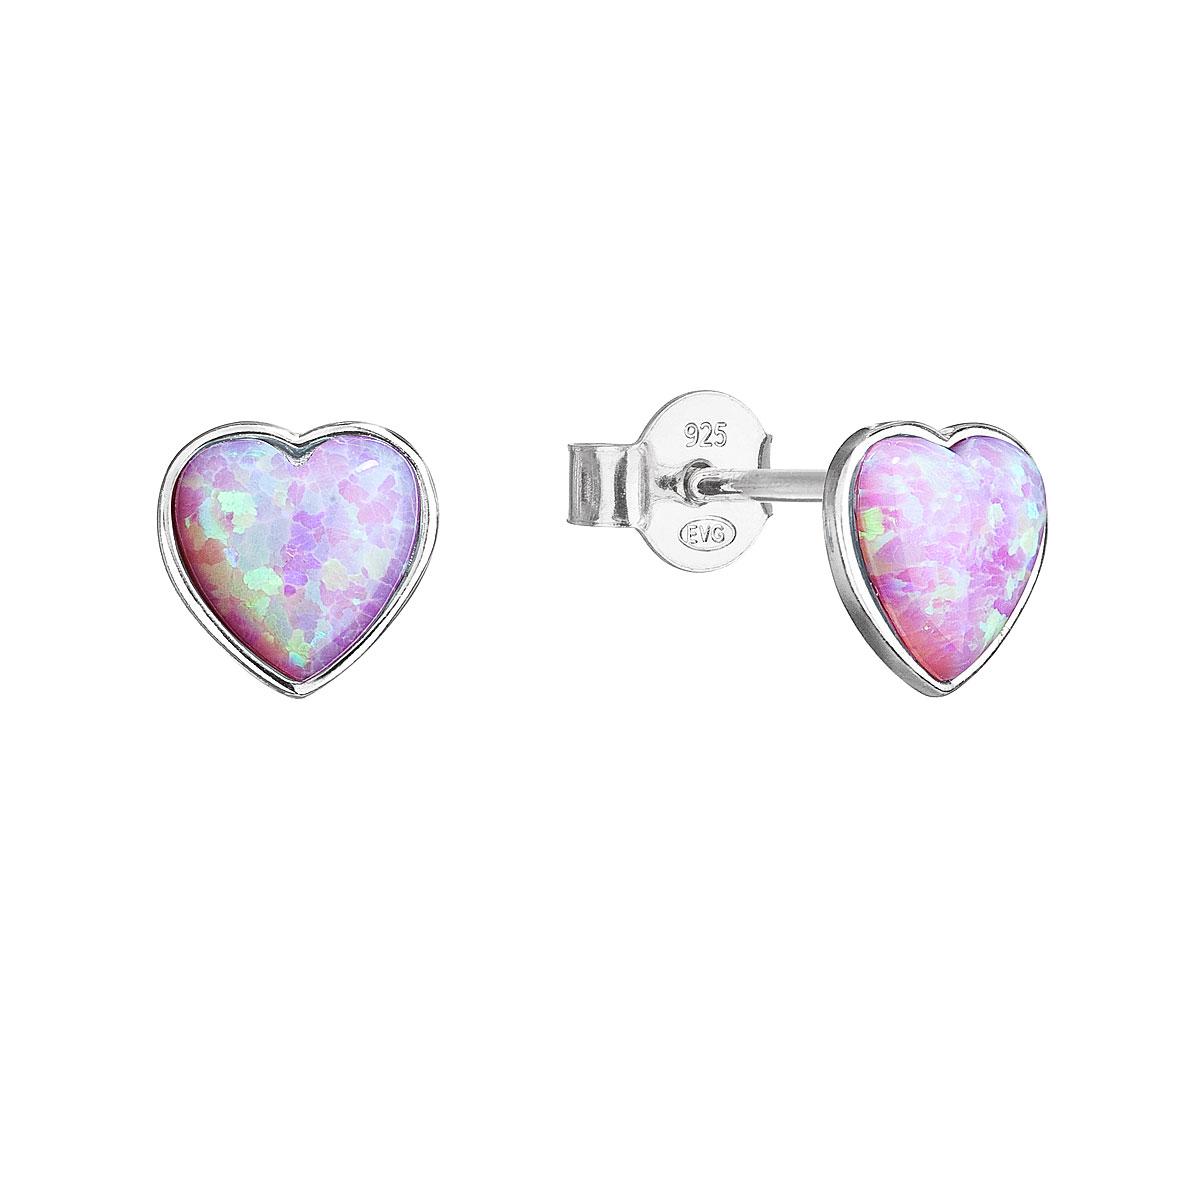 Strieborné náušnice perličky so syntetickým opálom ružové srdce 11337.3